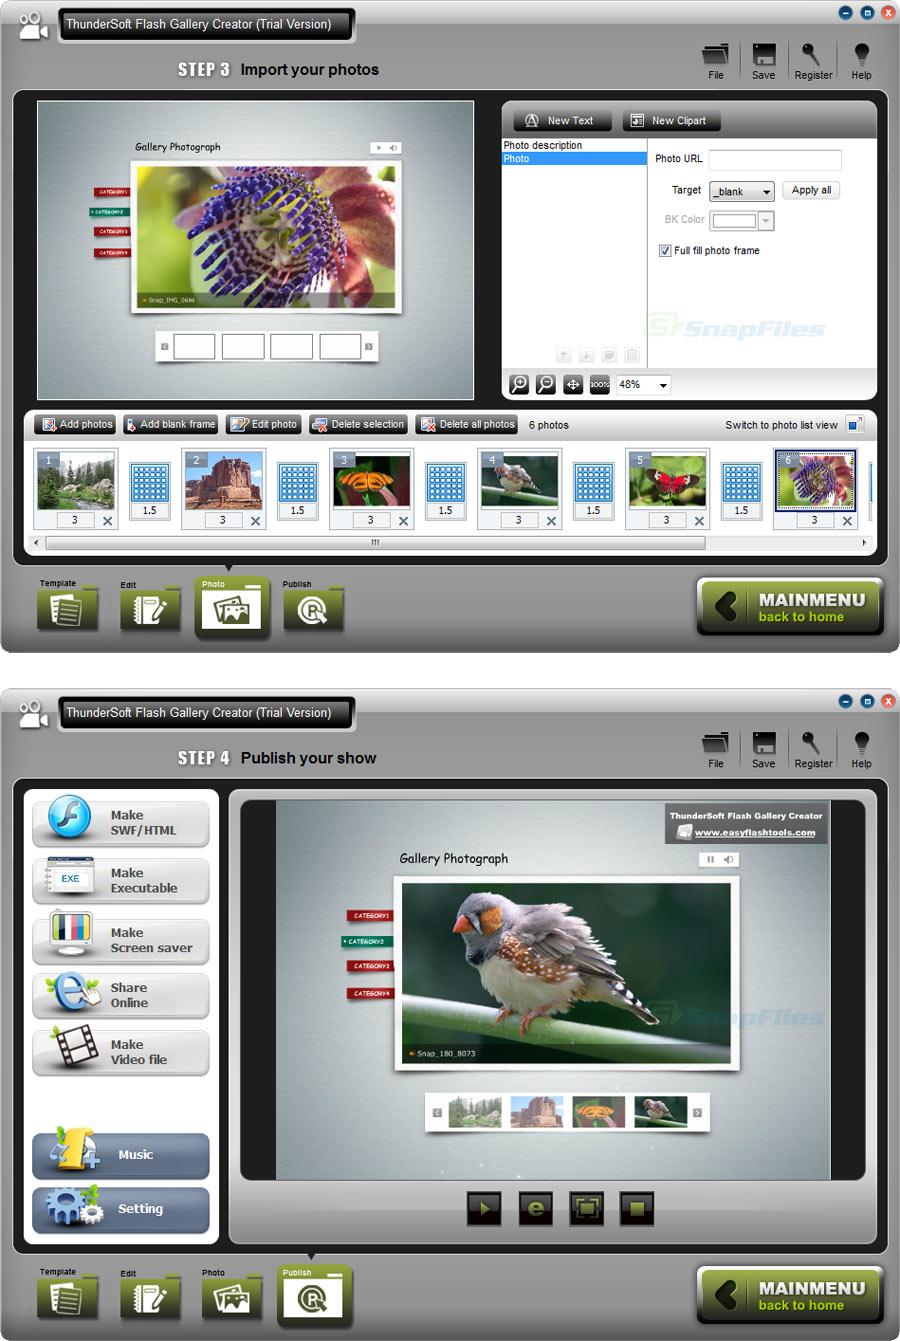 screenshot of ThunderSoft Flash Gallery Creator